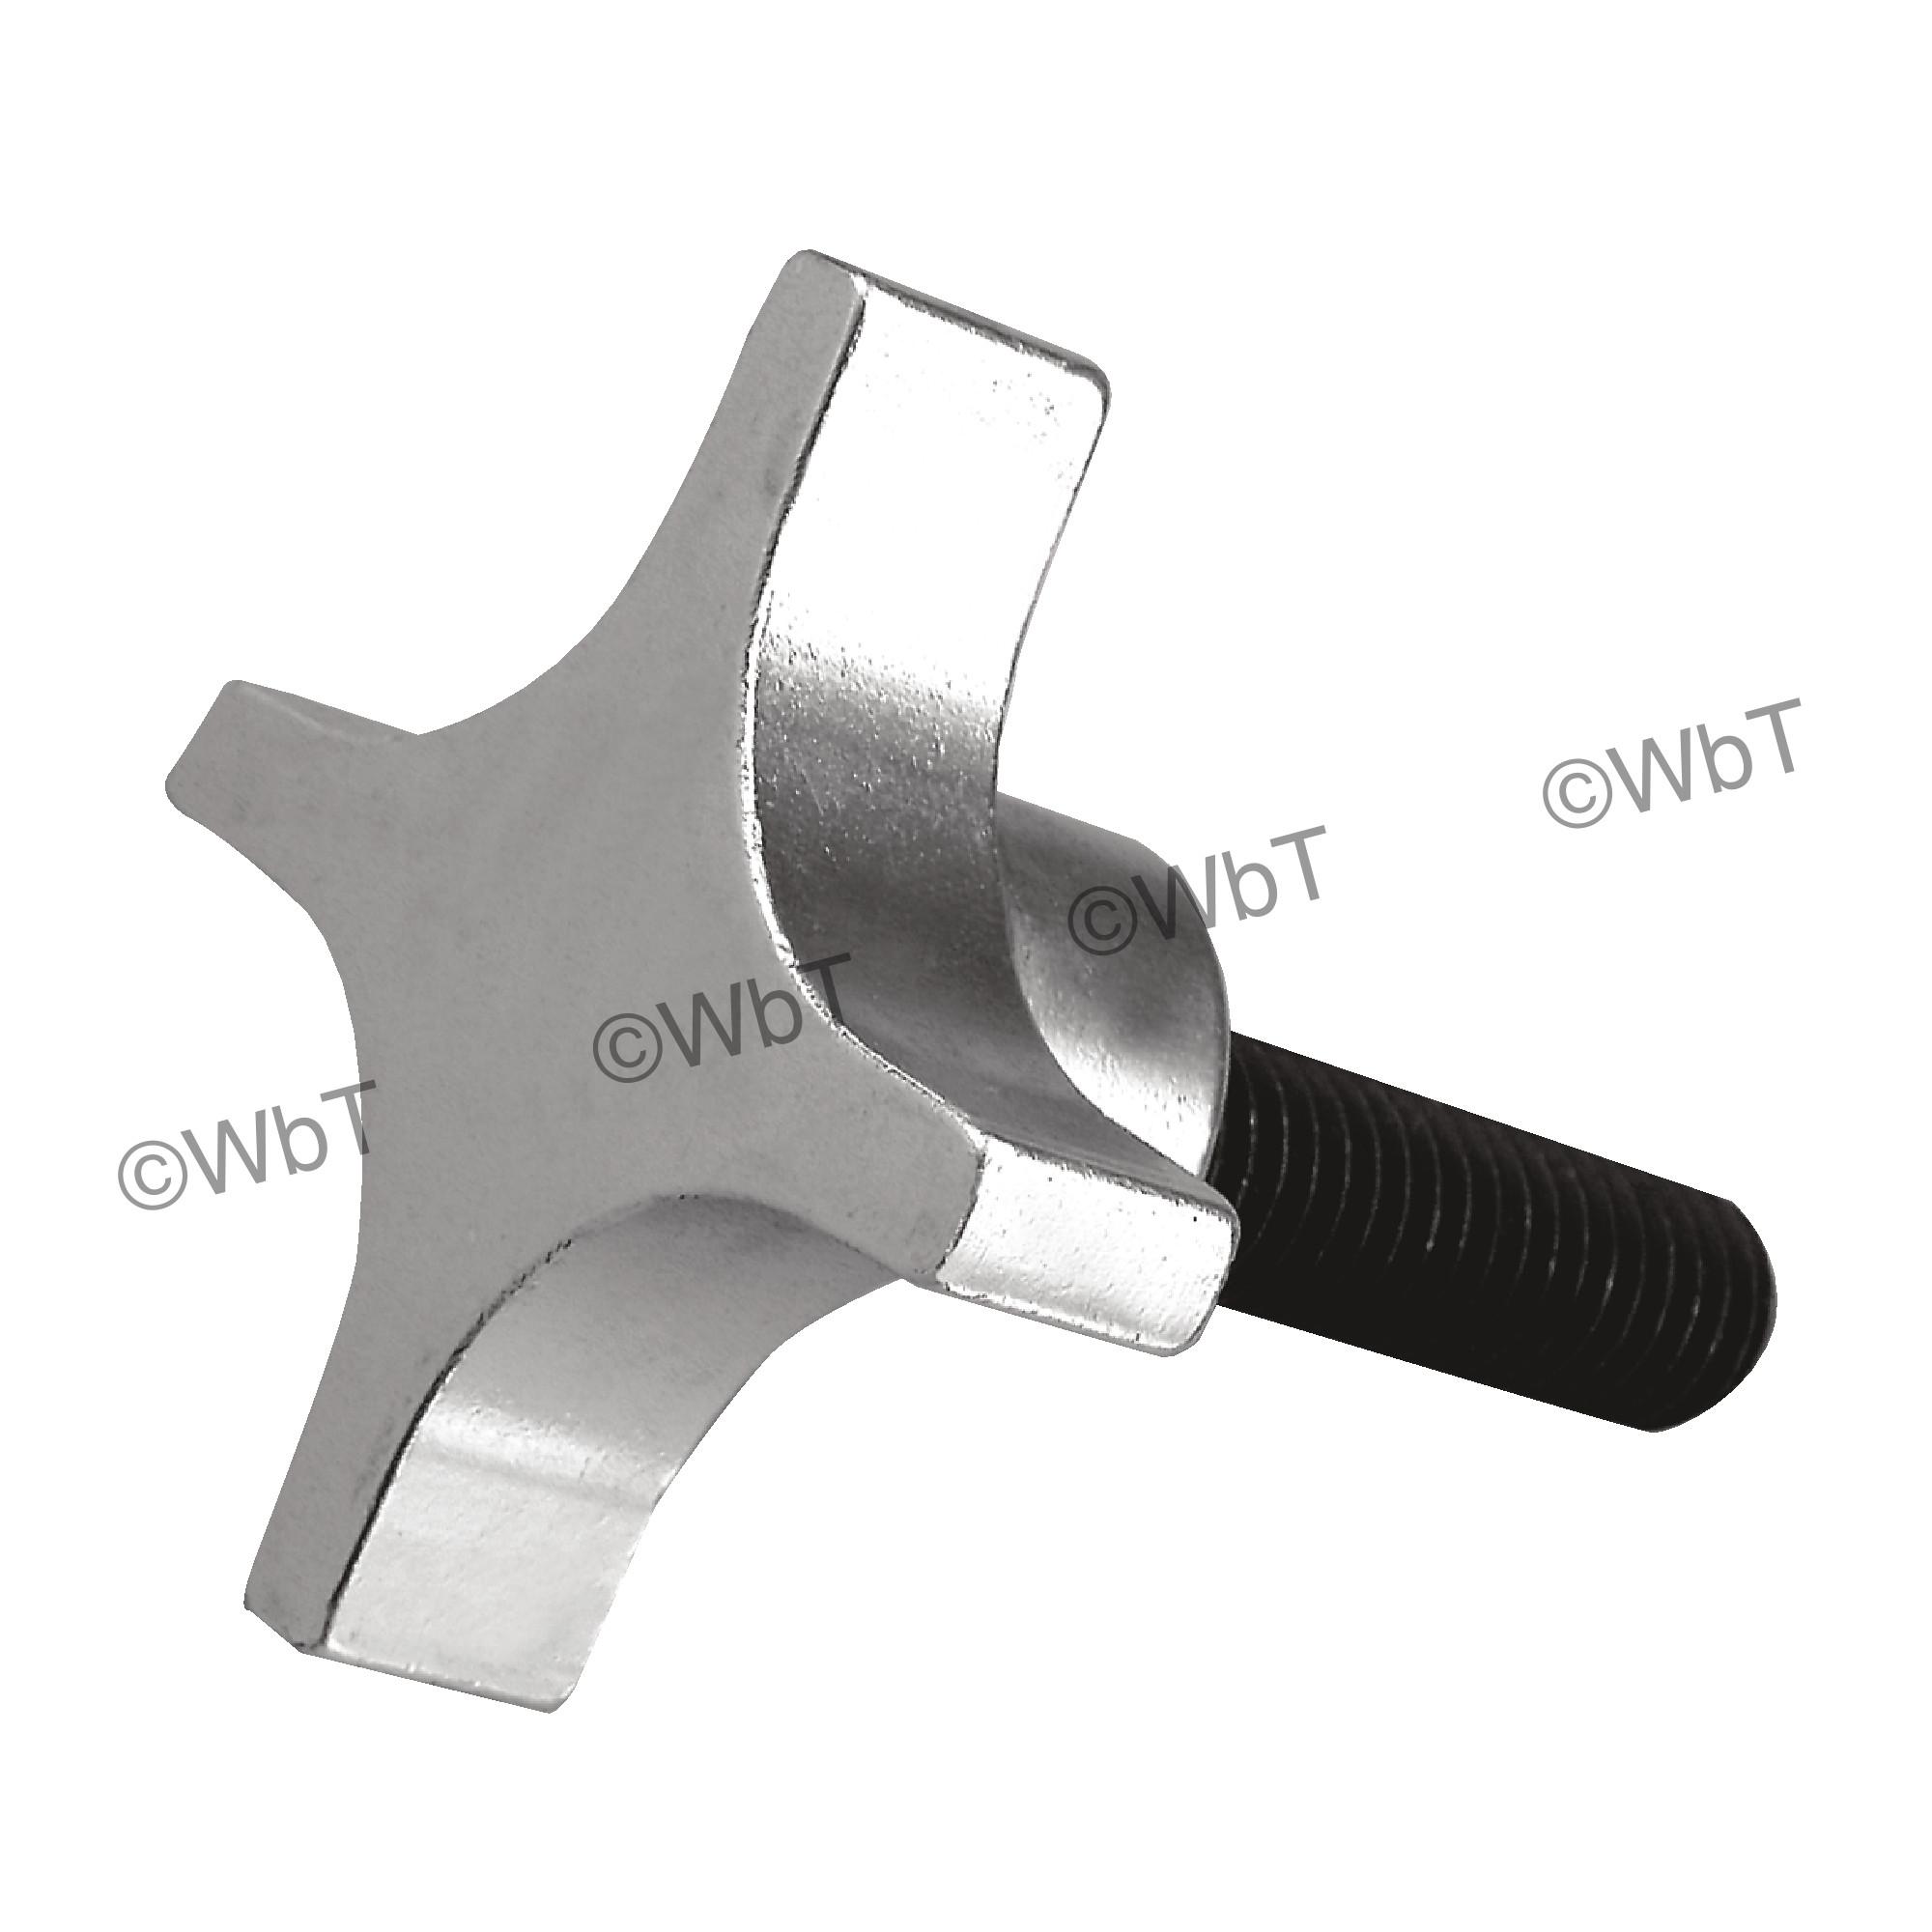 4-Star Extruded Aluminum Clamping Knob